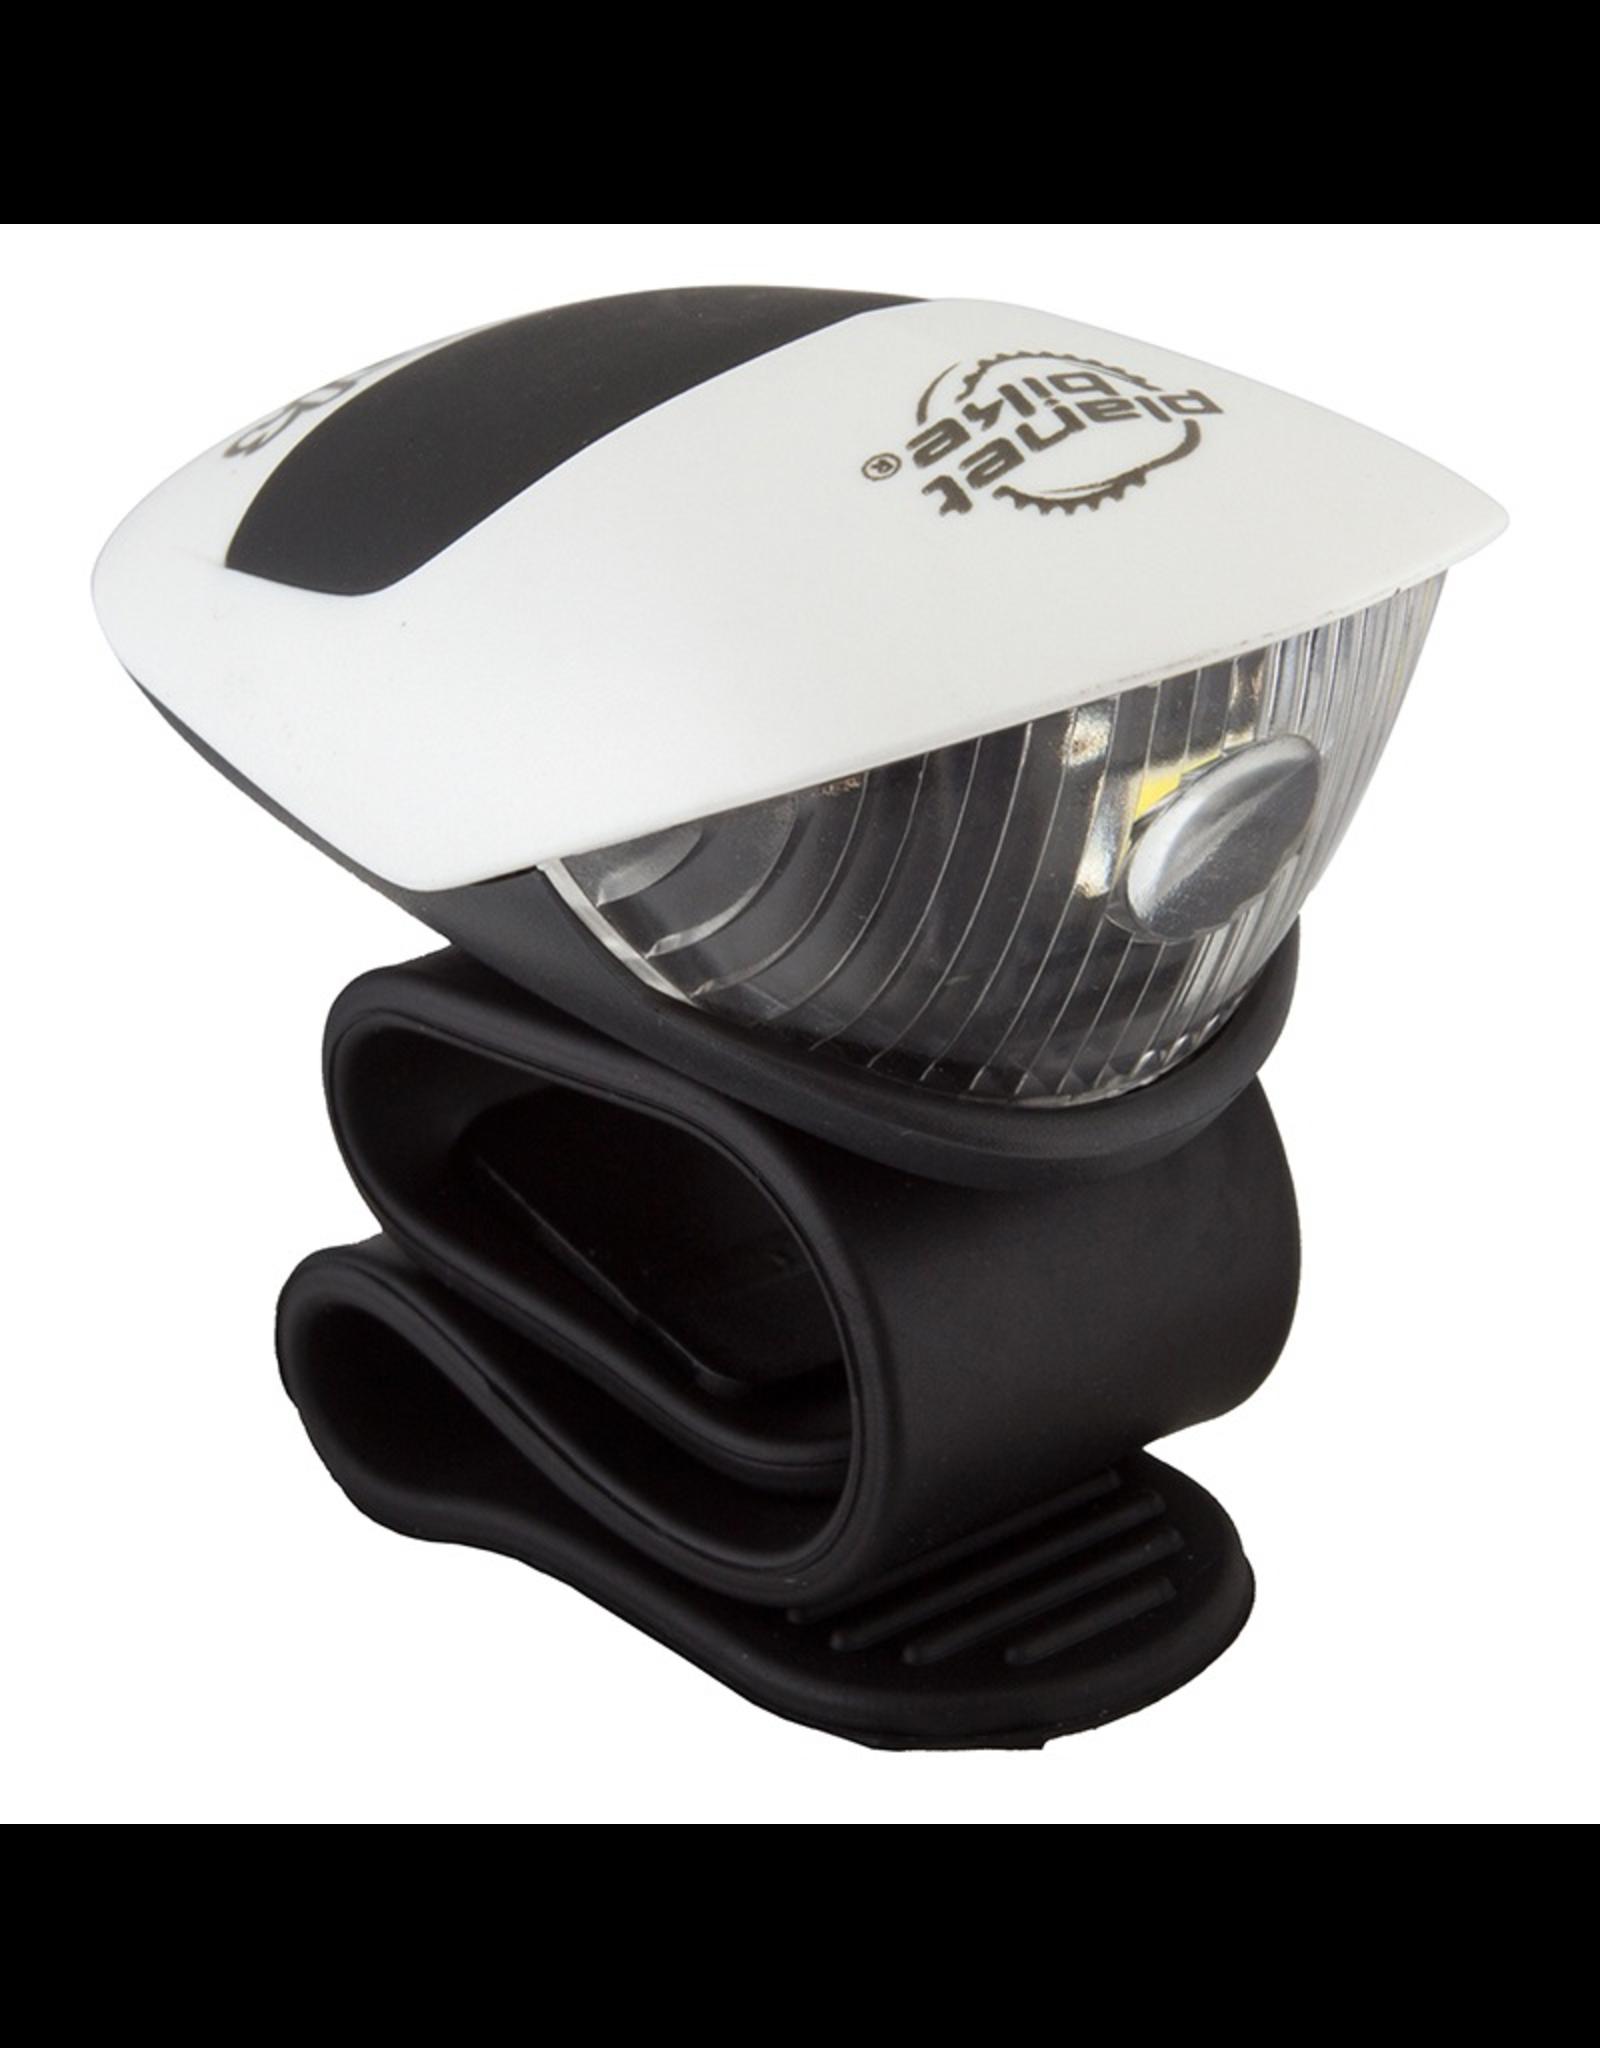 Planet Bike Planet Bike Battery Light - Spok LED Micro Headlight